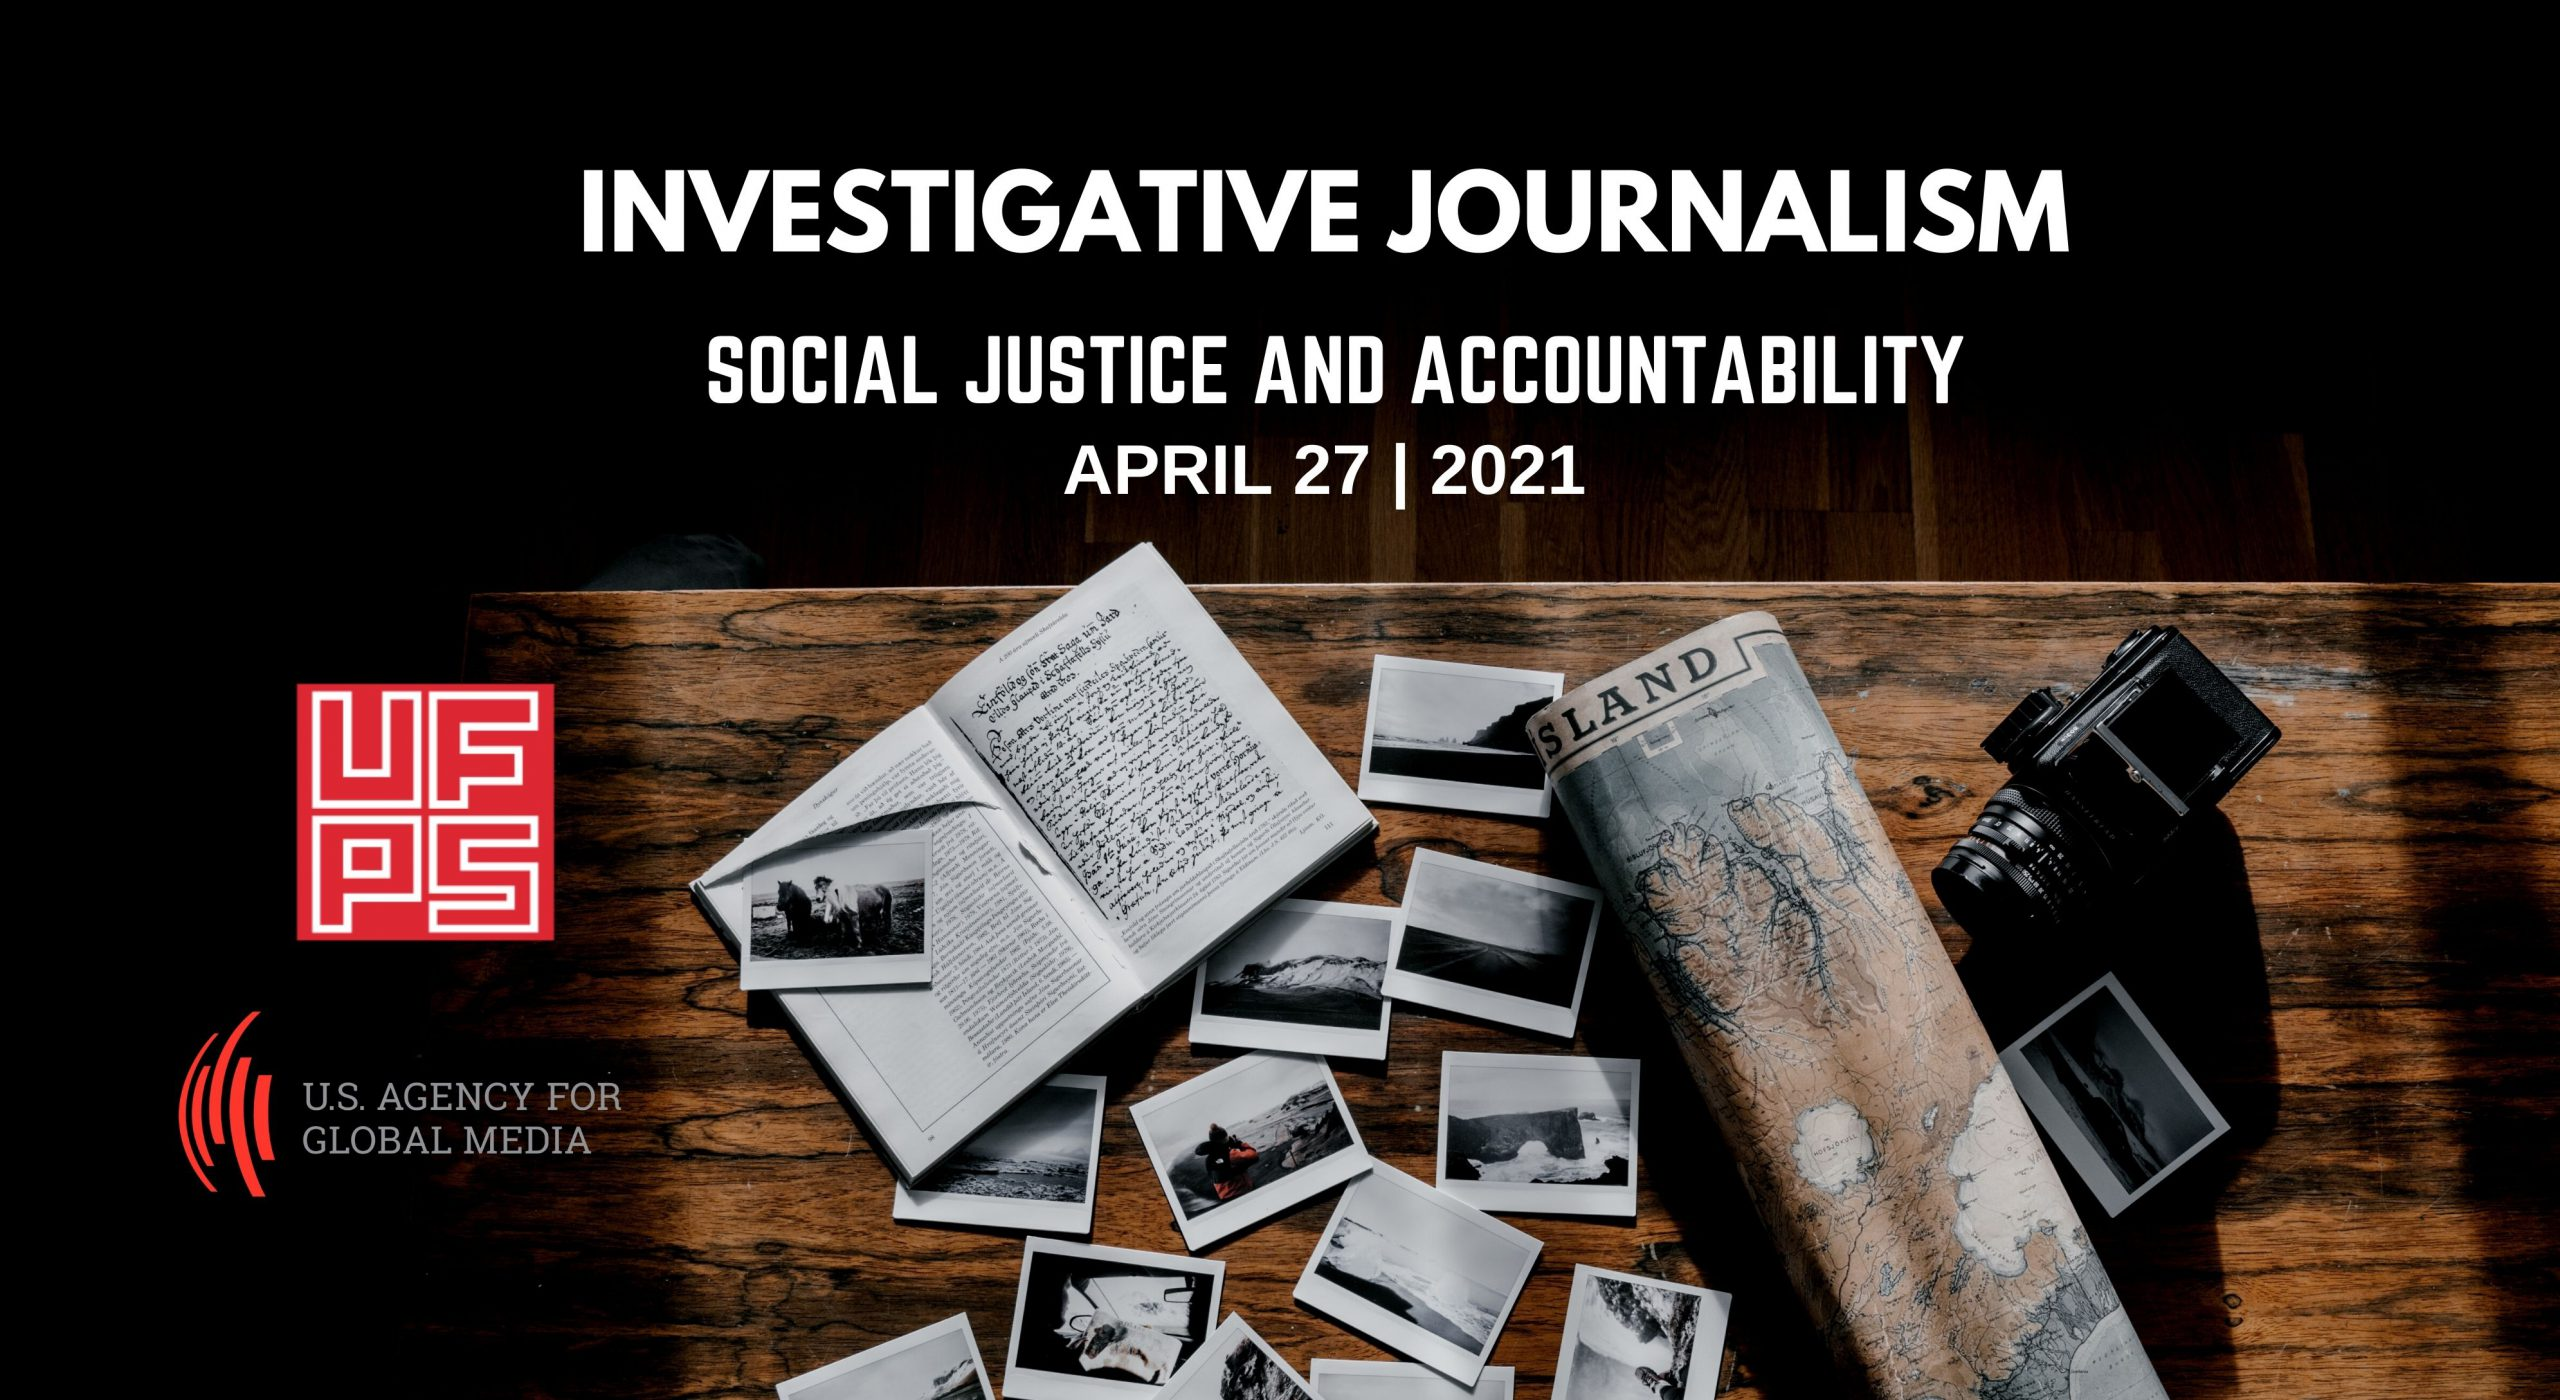 Latin America: Investigative Journalism